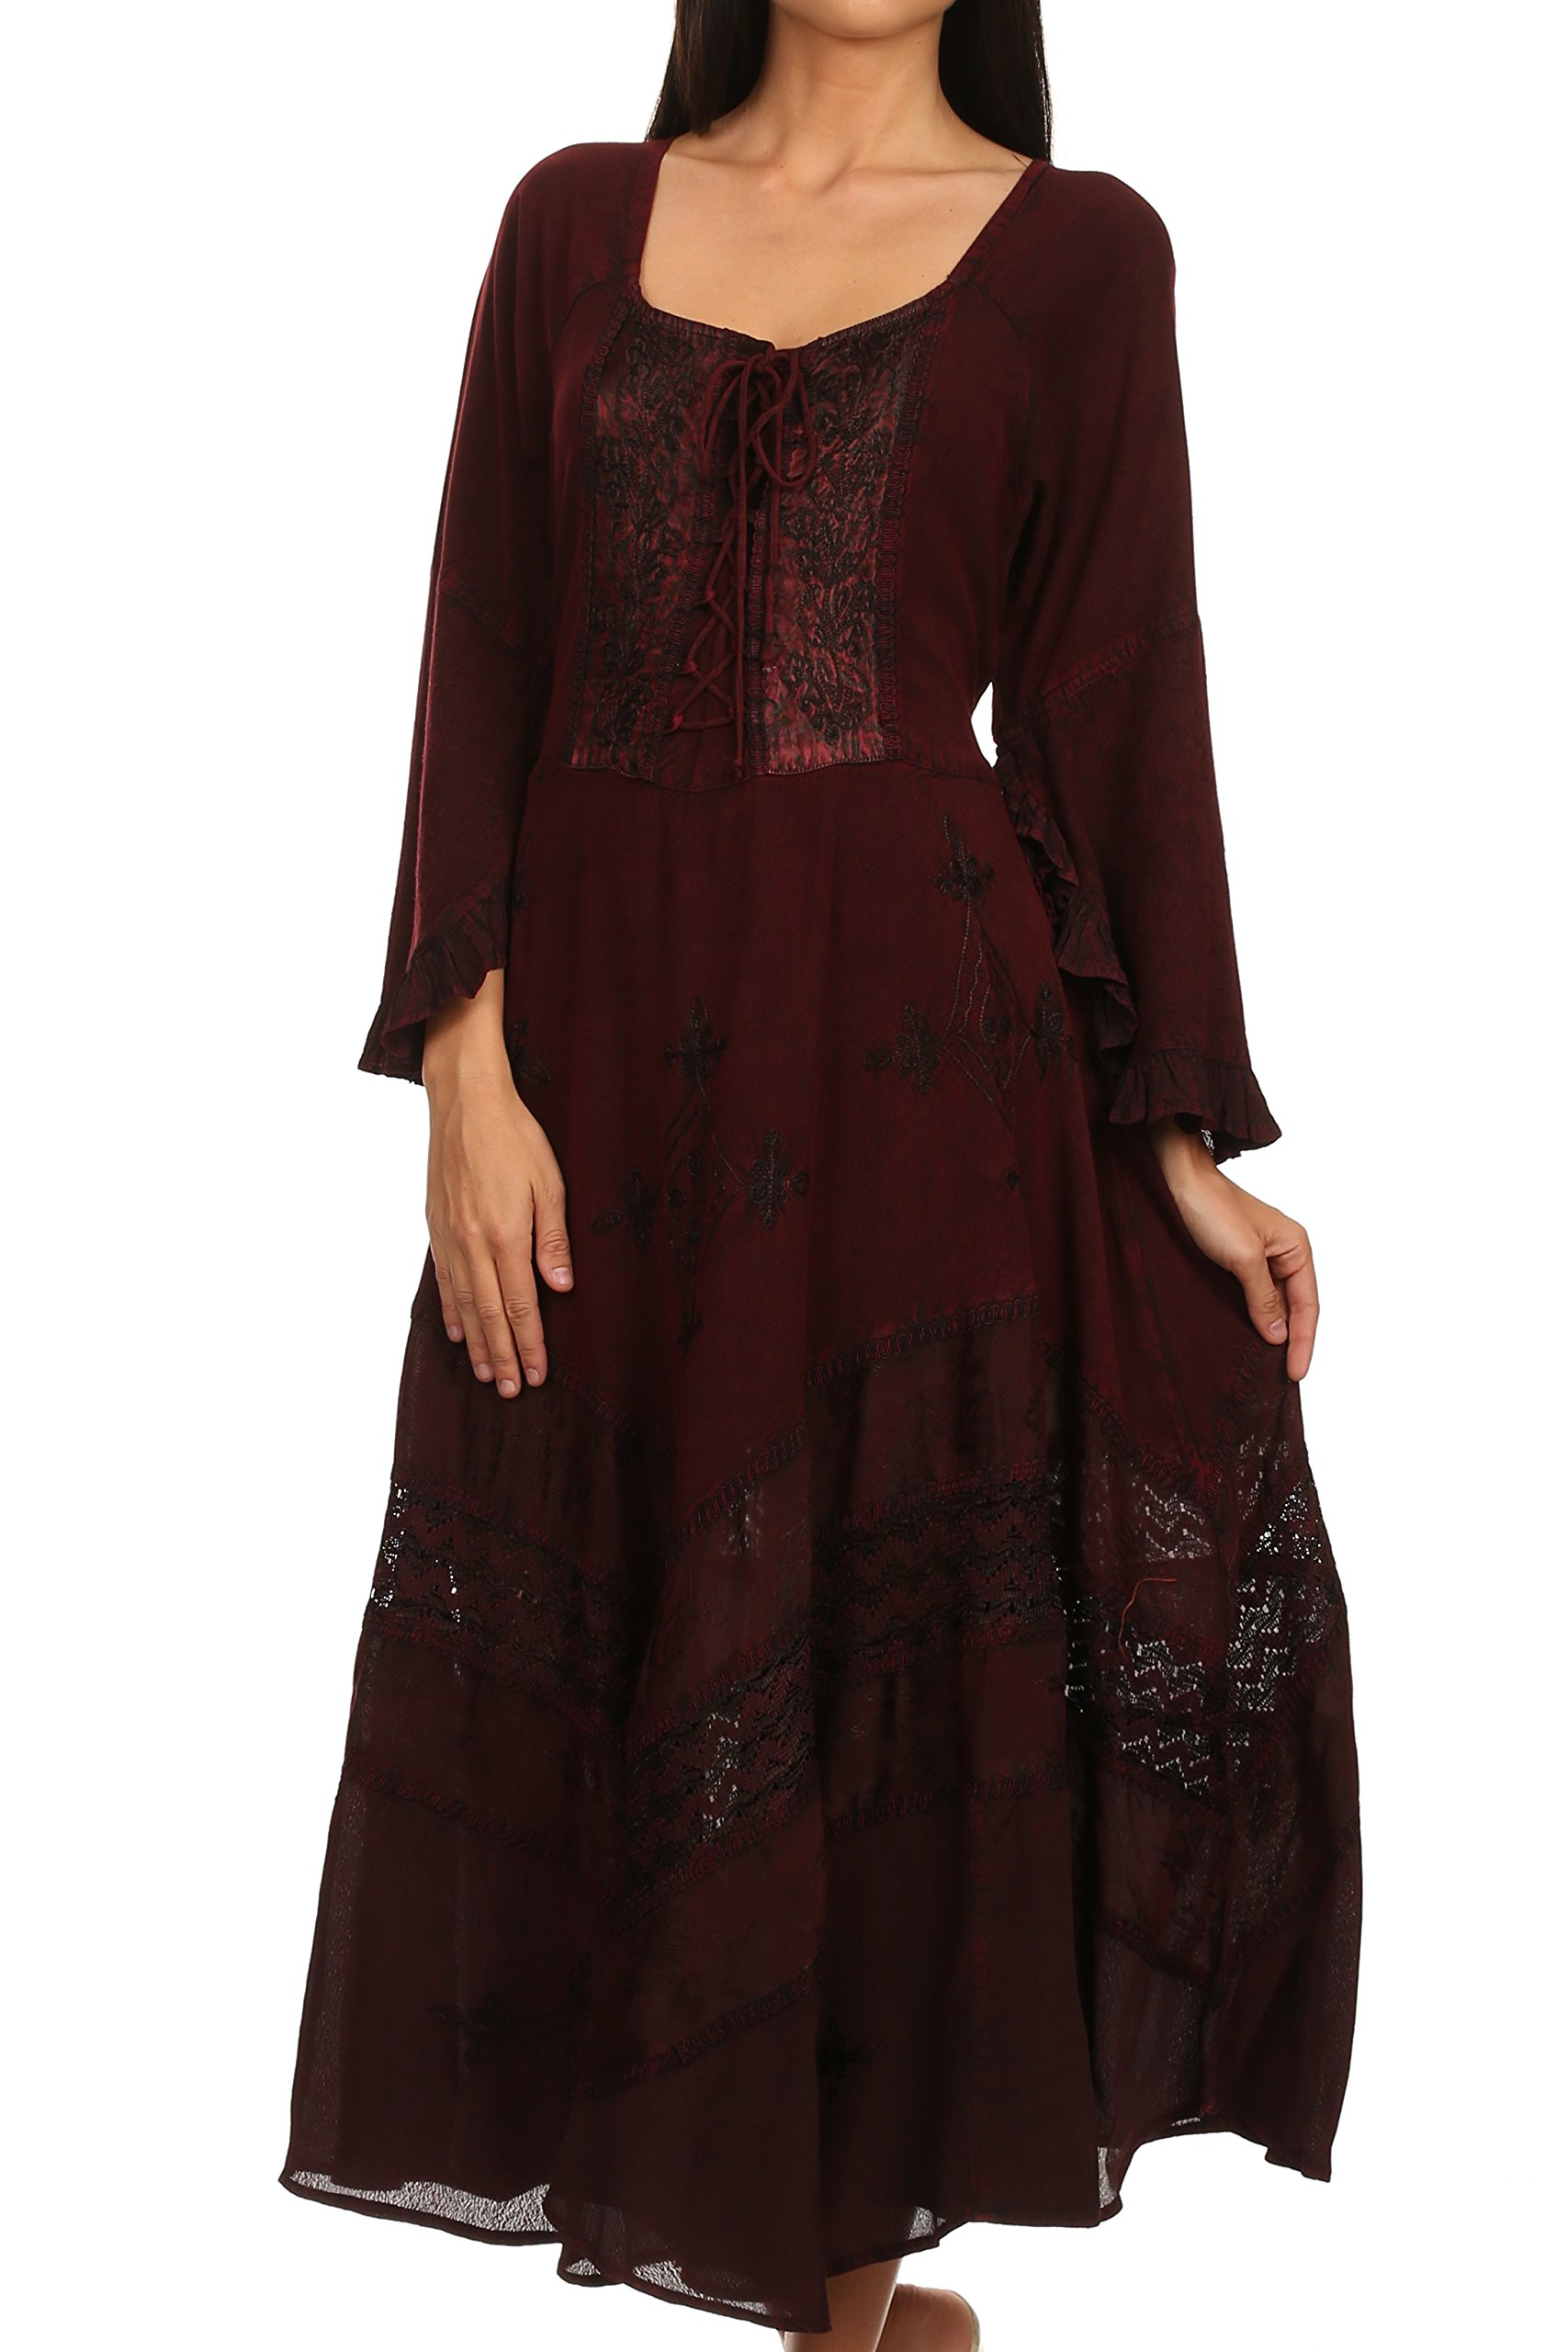 Mirabel Stonewashed Corset Style Floral Emboridery Kimono Sleeve Dress